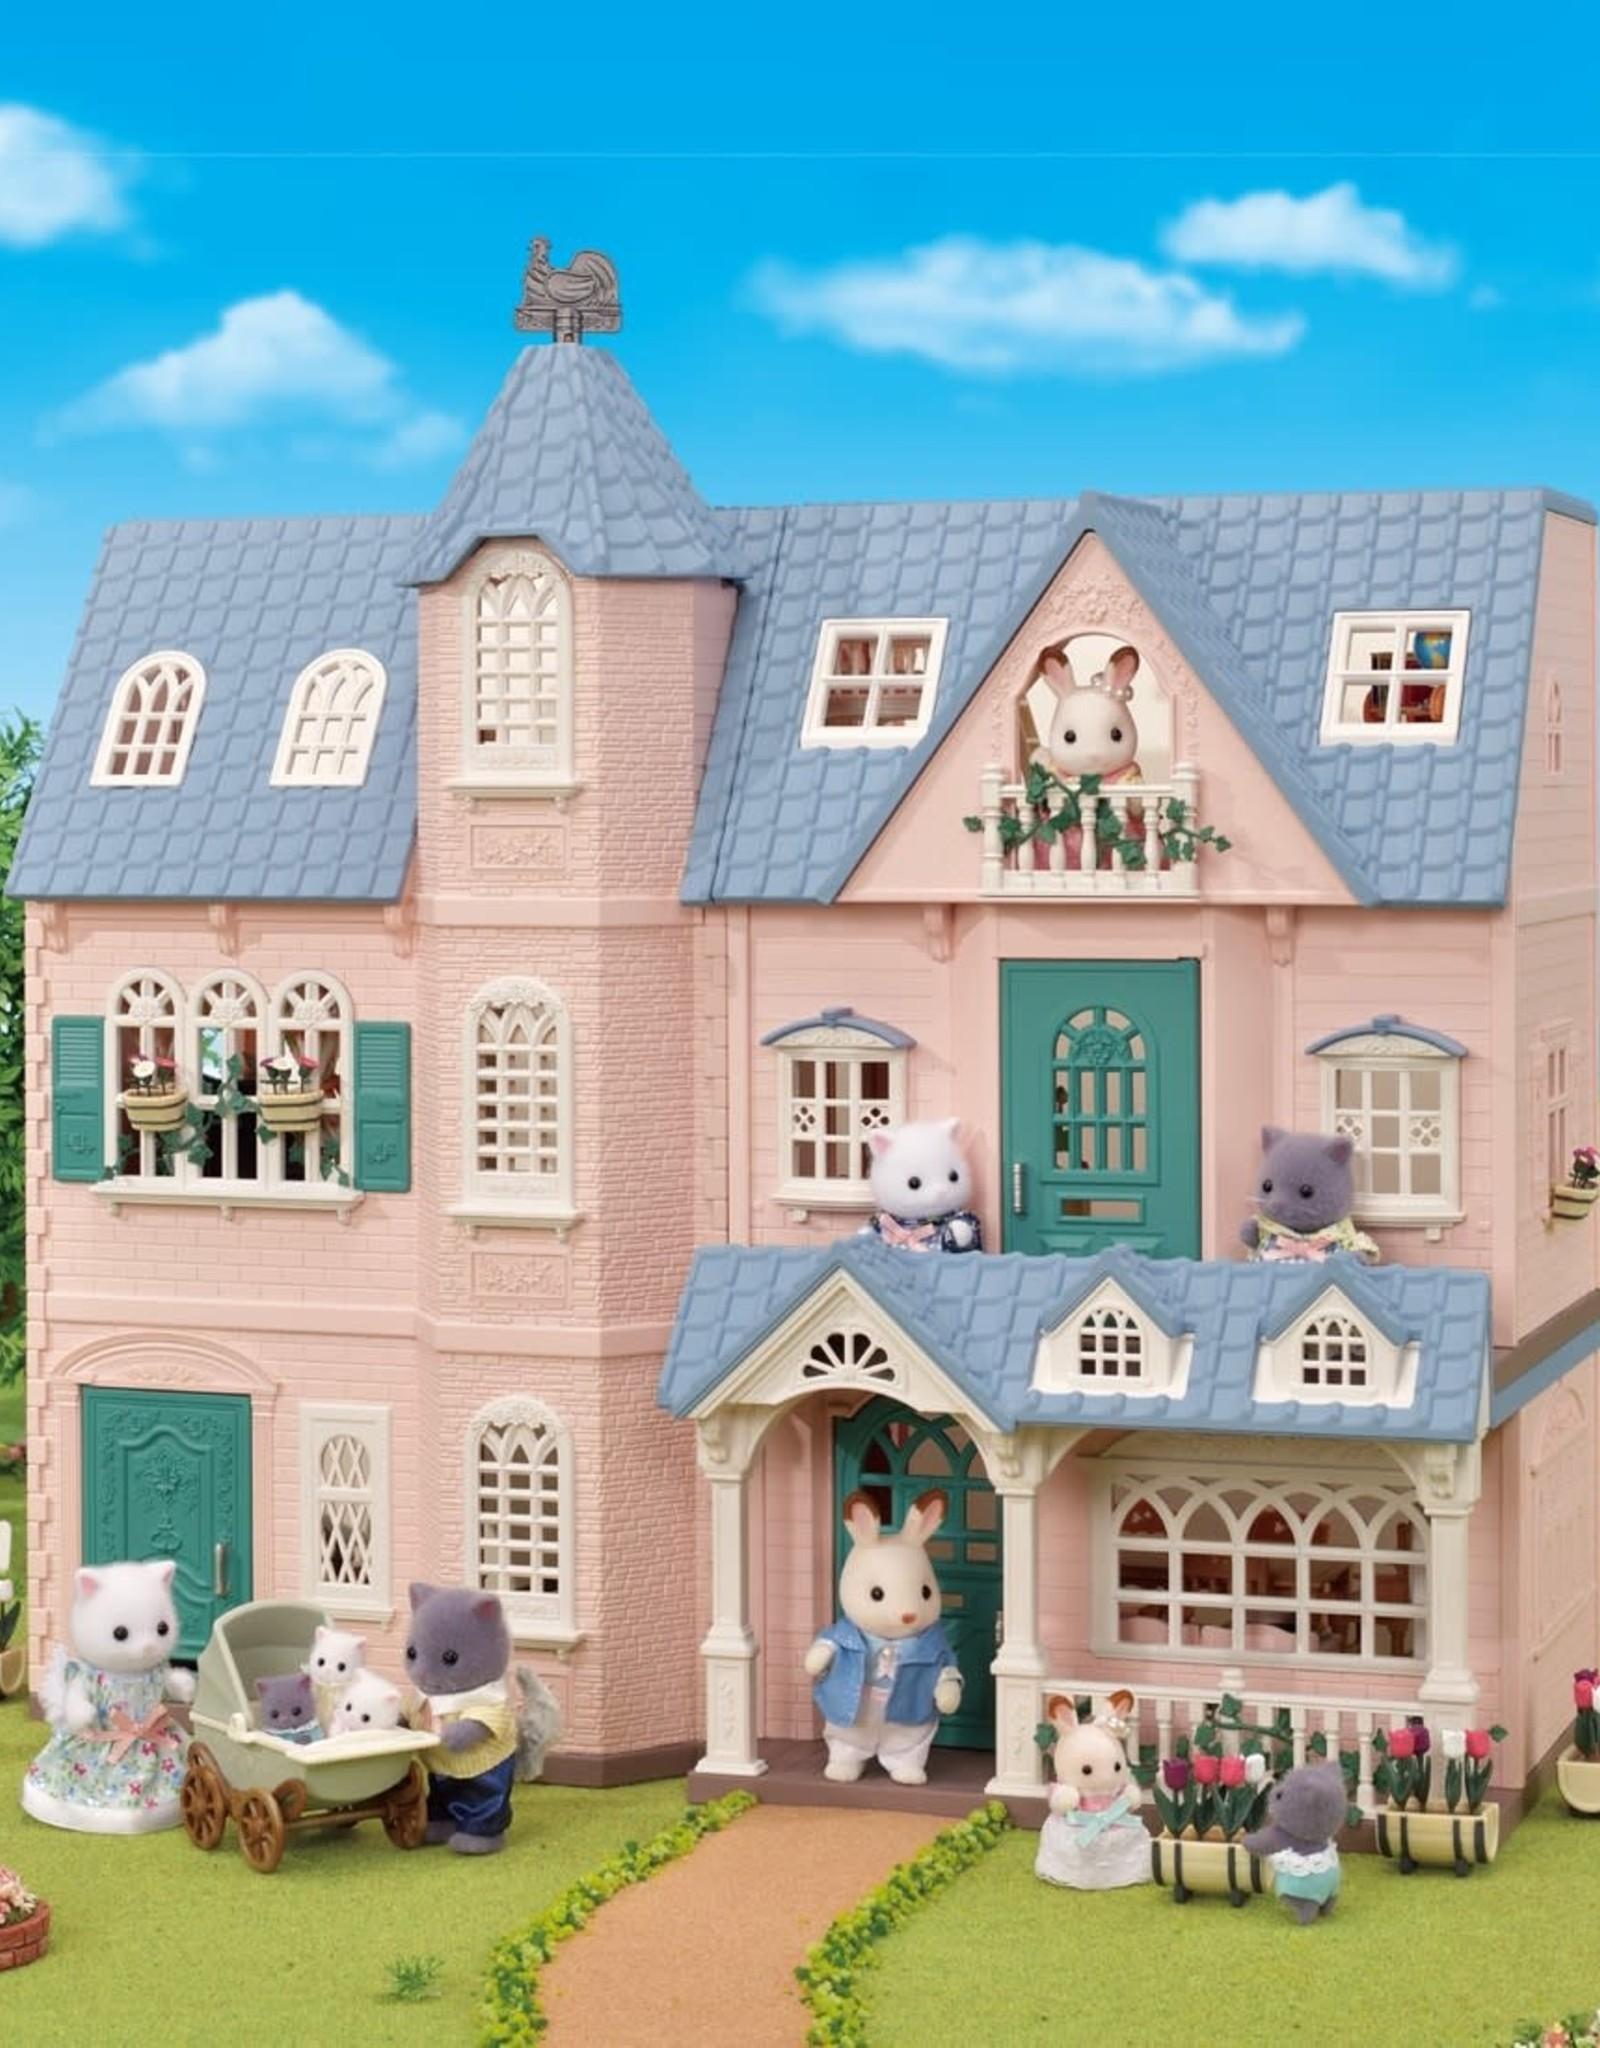 Sylvanian Families Deluxe Celebration Home gift set